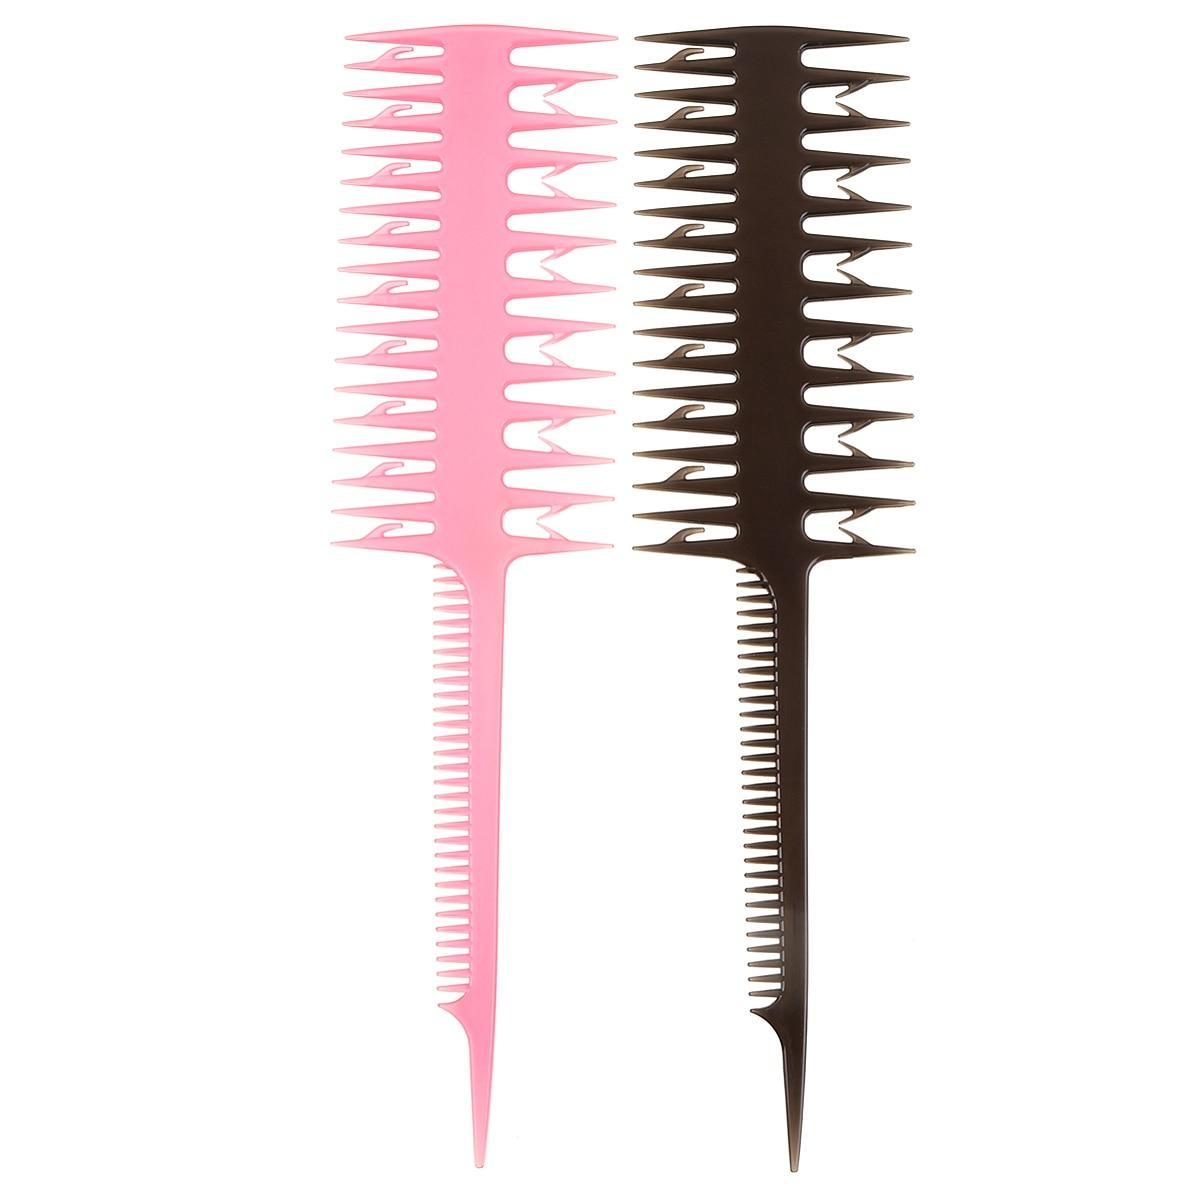 1 Pcs Salon Professional Tint Dye Highlighting Comb Fish